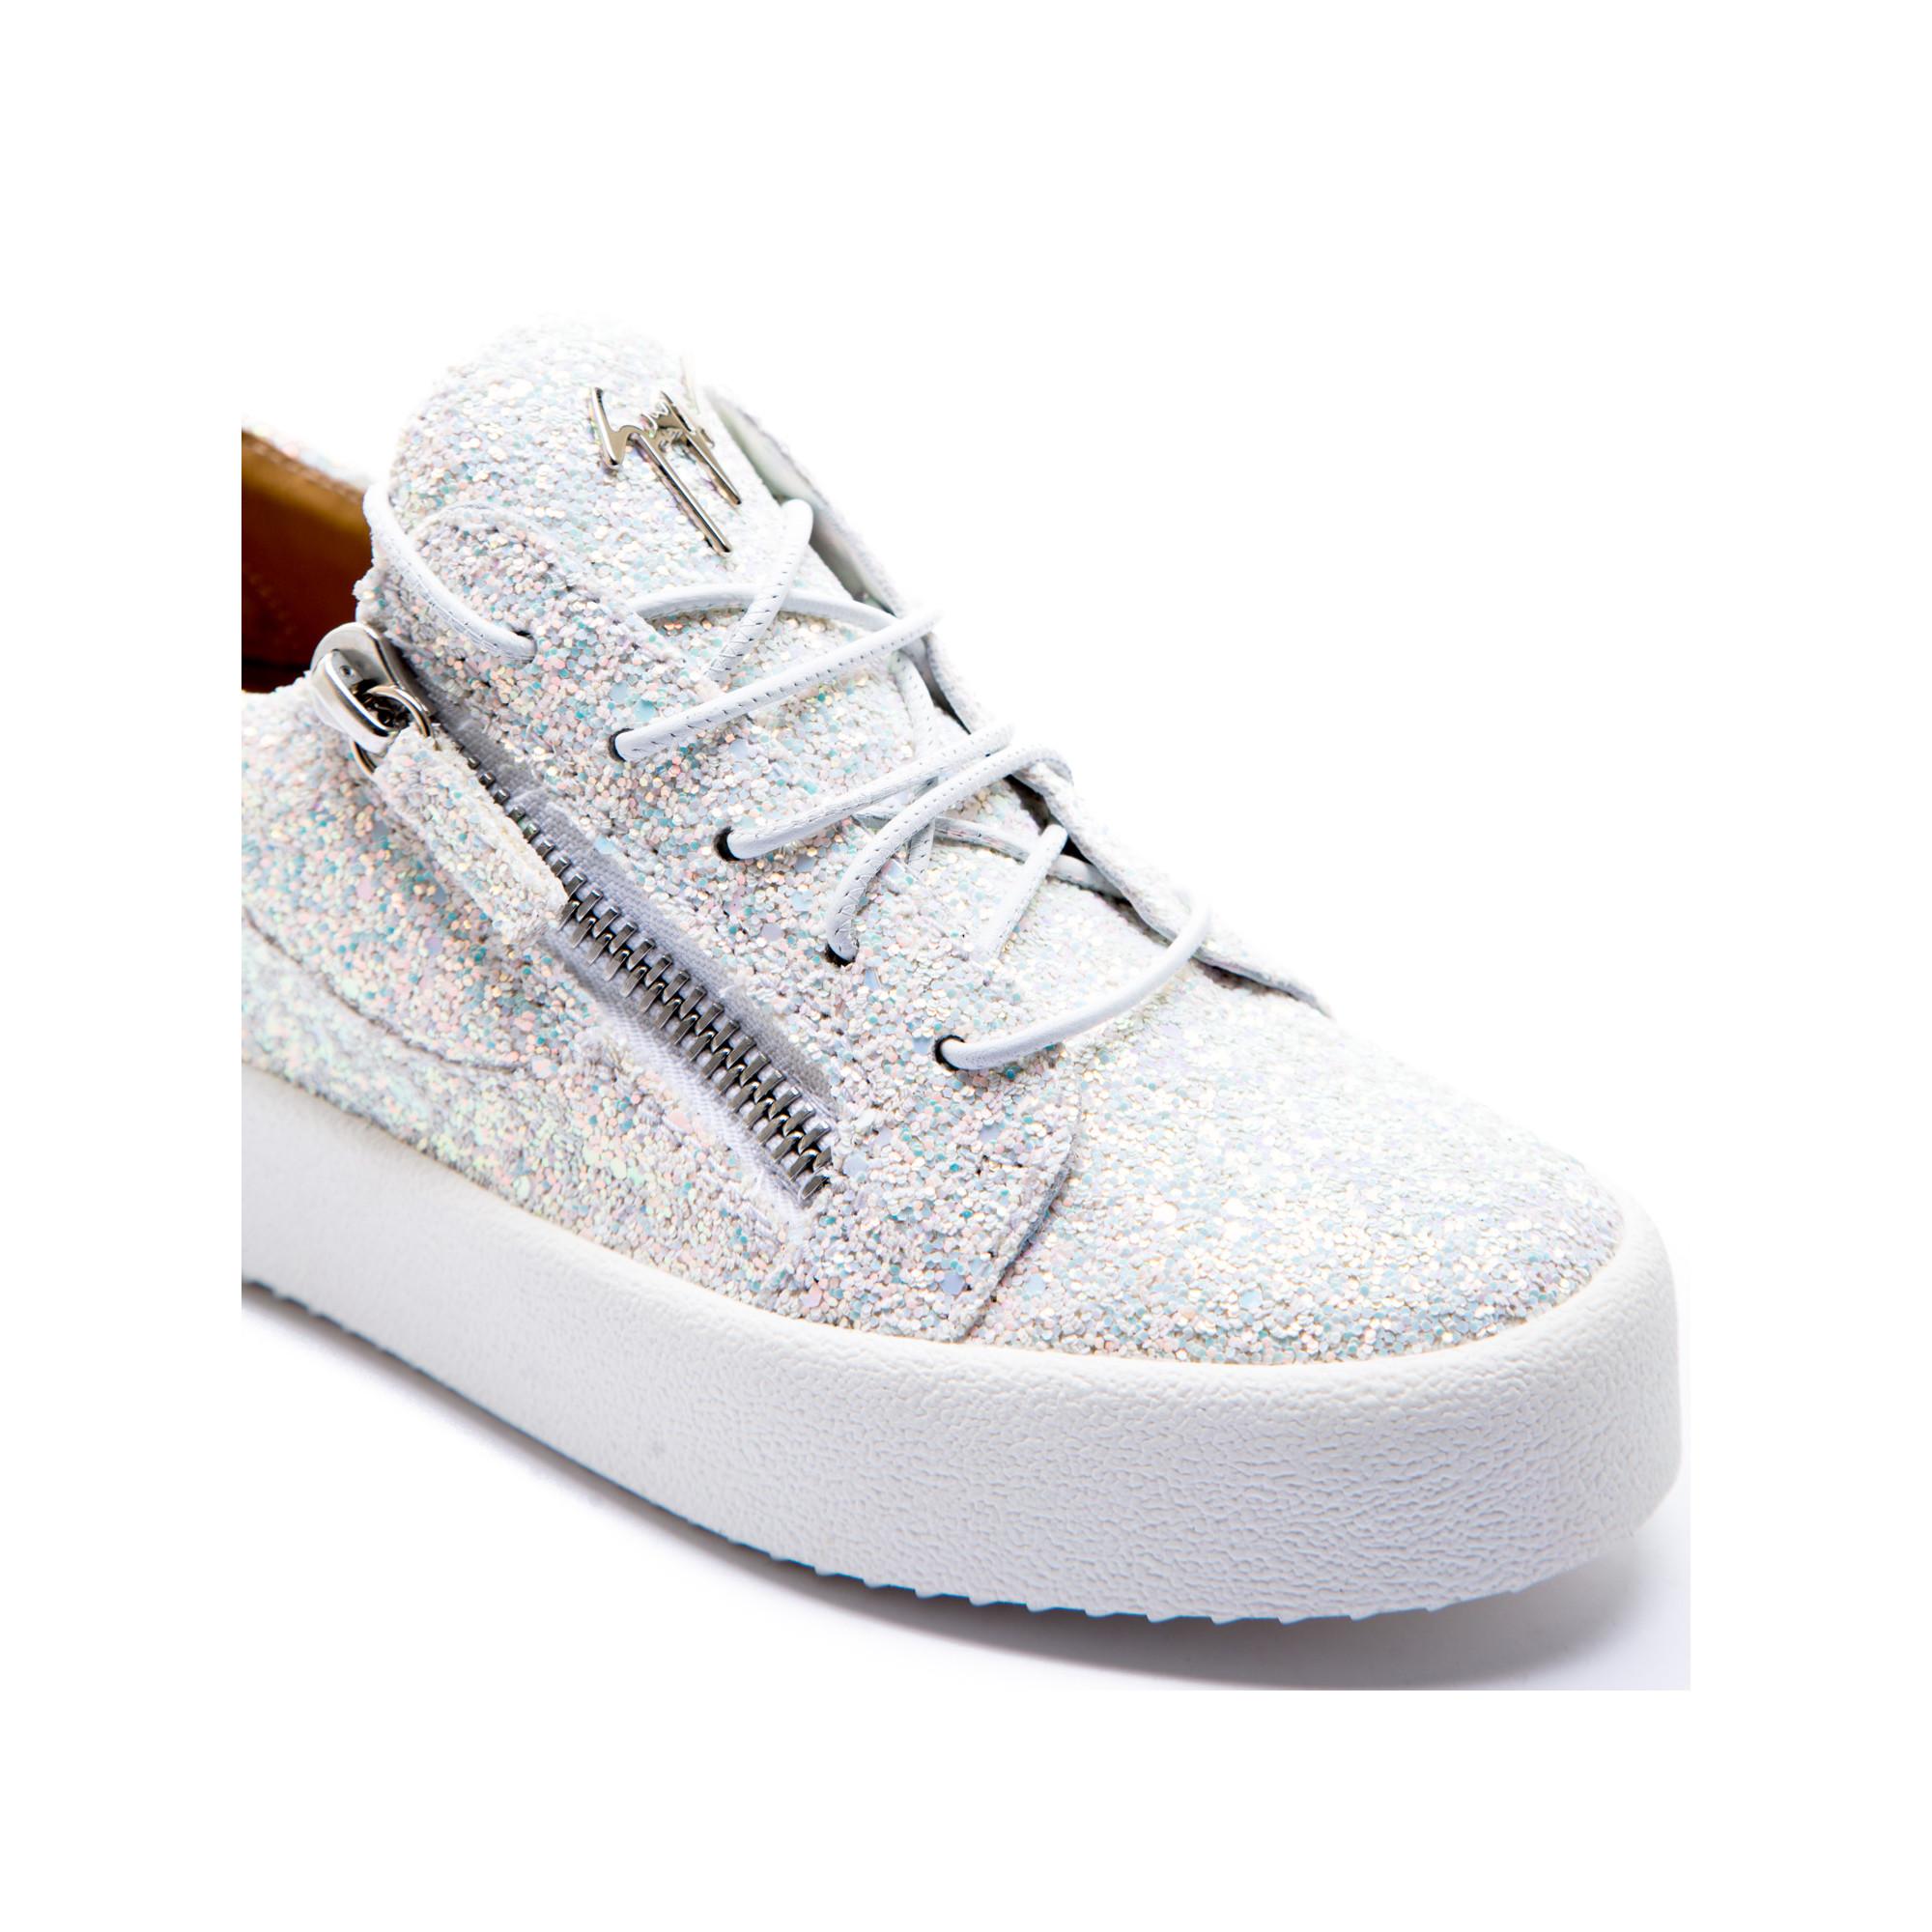 Chaussures Multicolores Giuseppe Zanotti Taille 35 Pour Les Femmes SlTJh